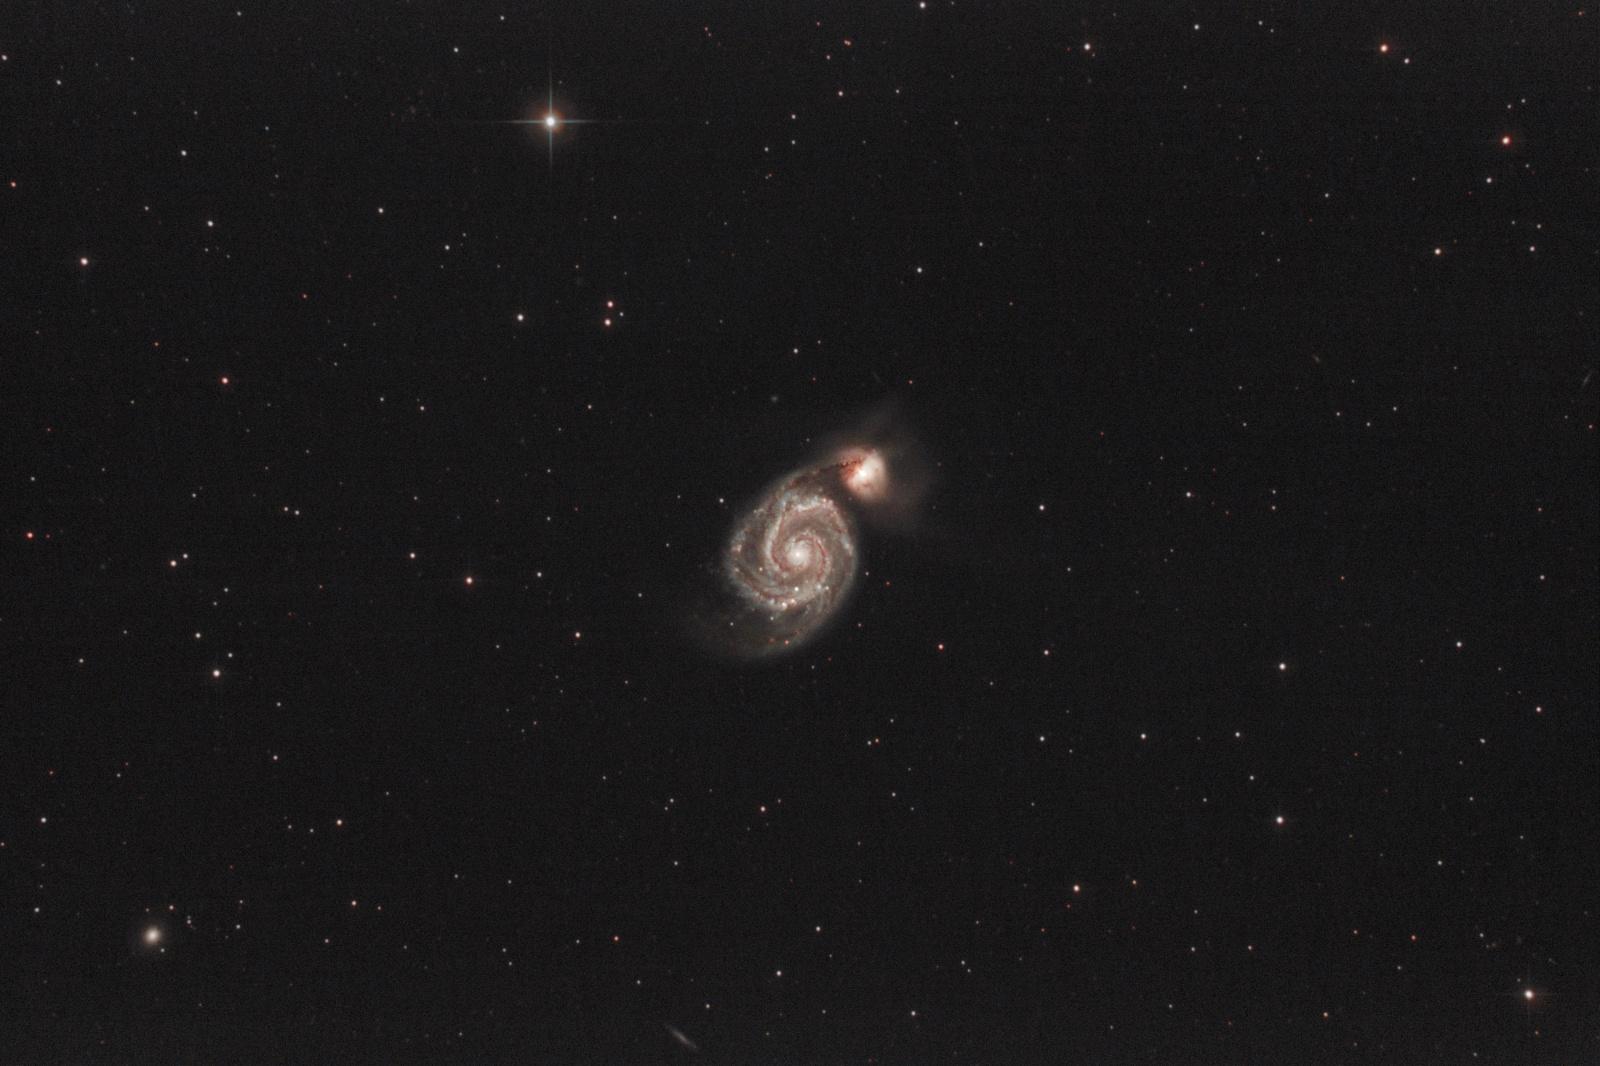 M_51-light-BINNING_1-RGB.thumb.jpg.1ad915d07cdc84f5ae613baae2b8495c.jpg